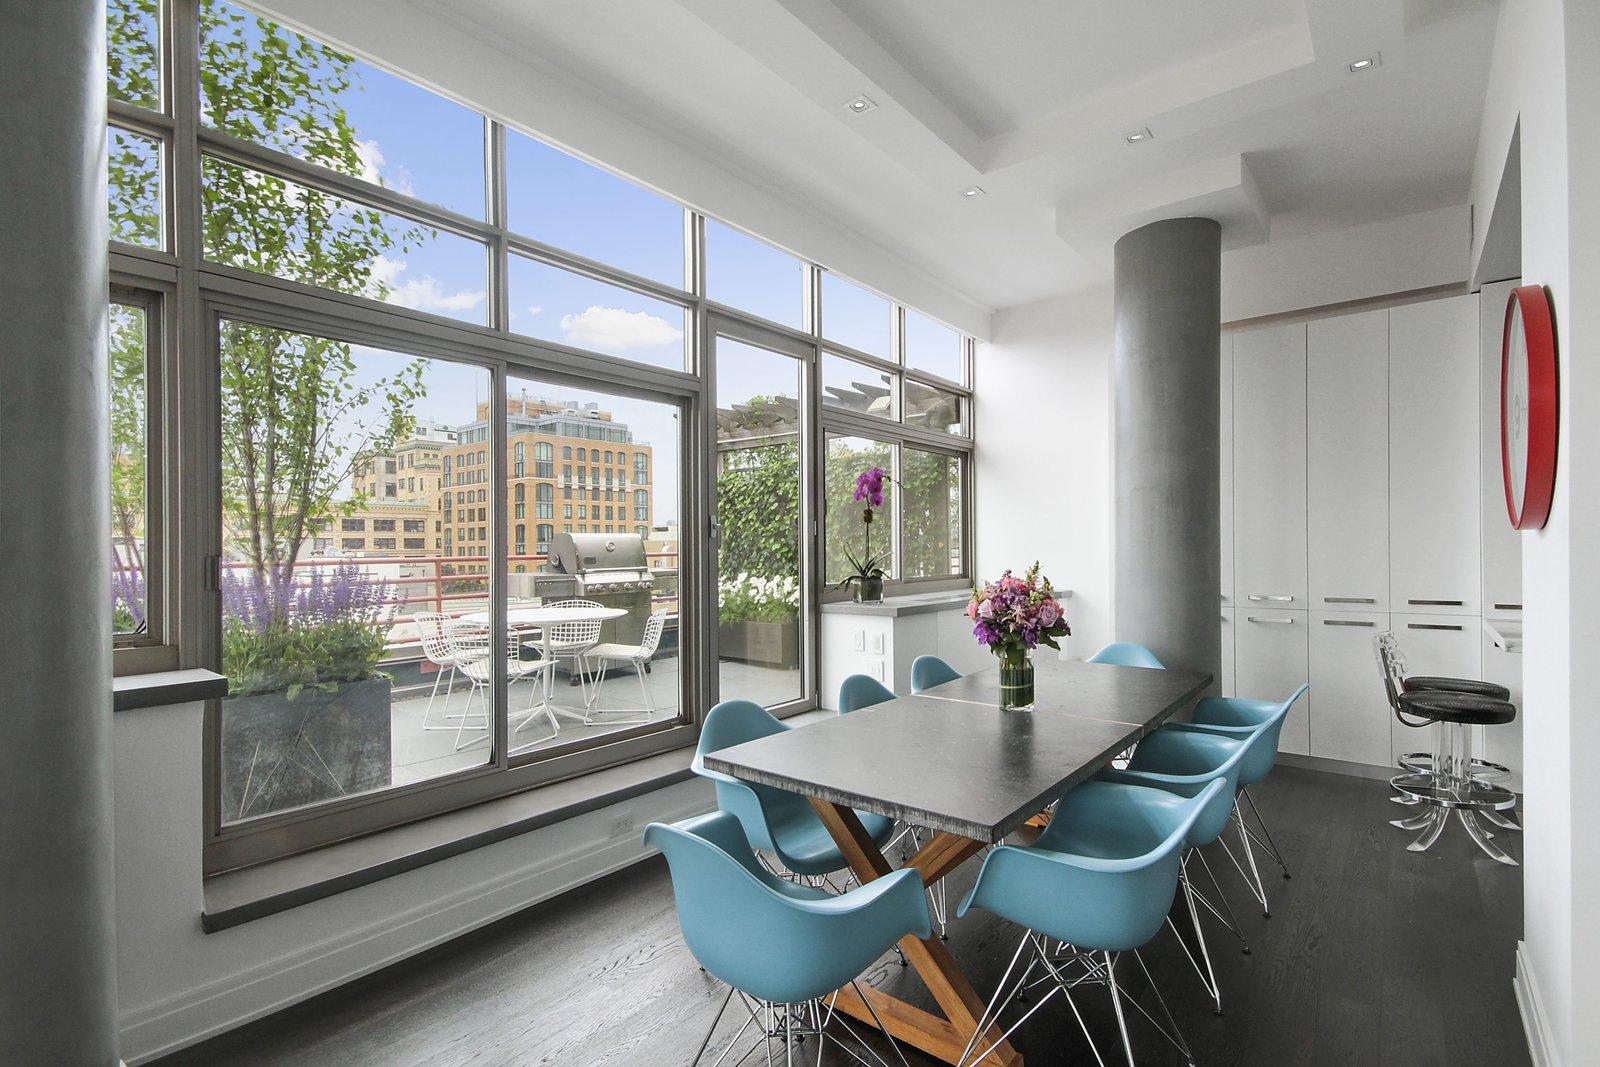 Dining Room, Chair, Recessed Lighting, Stools, Dark Hardwood Floor, and Table West Village Terrace  Eames Molded Chairs from West Village Terrace